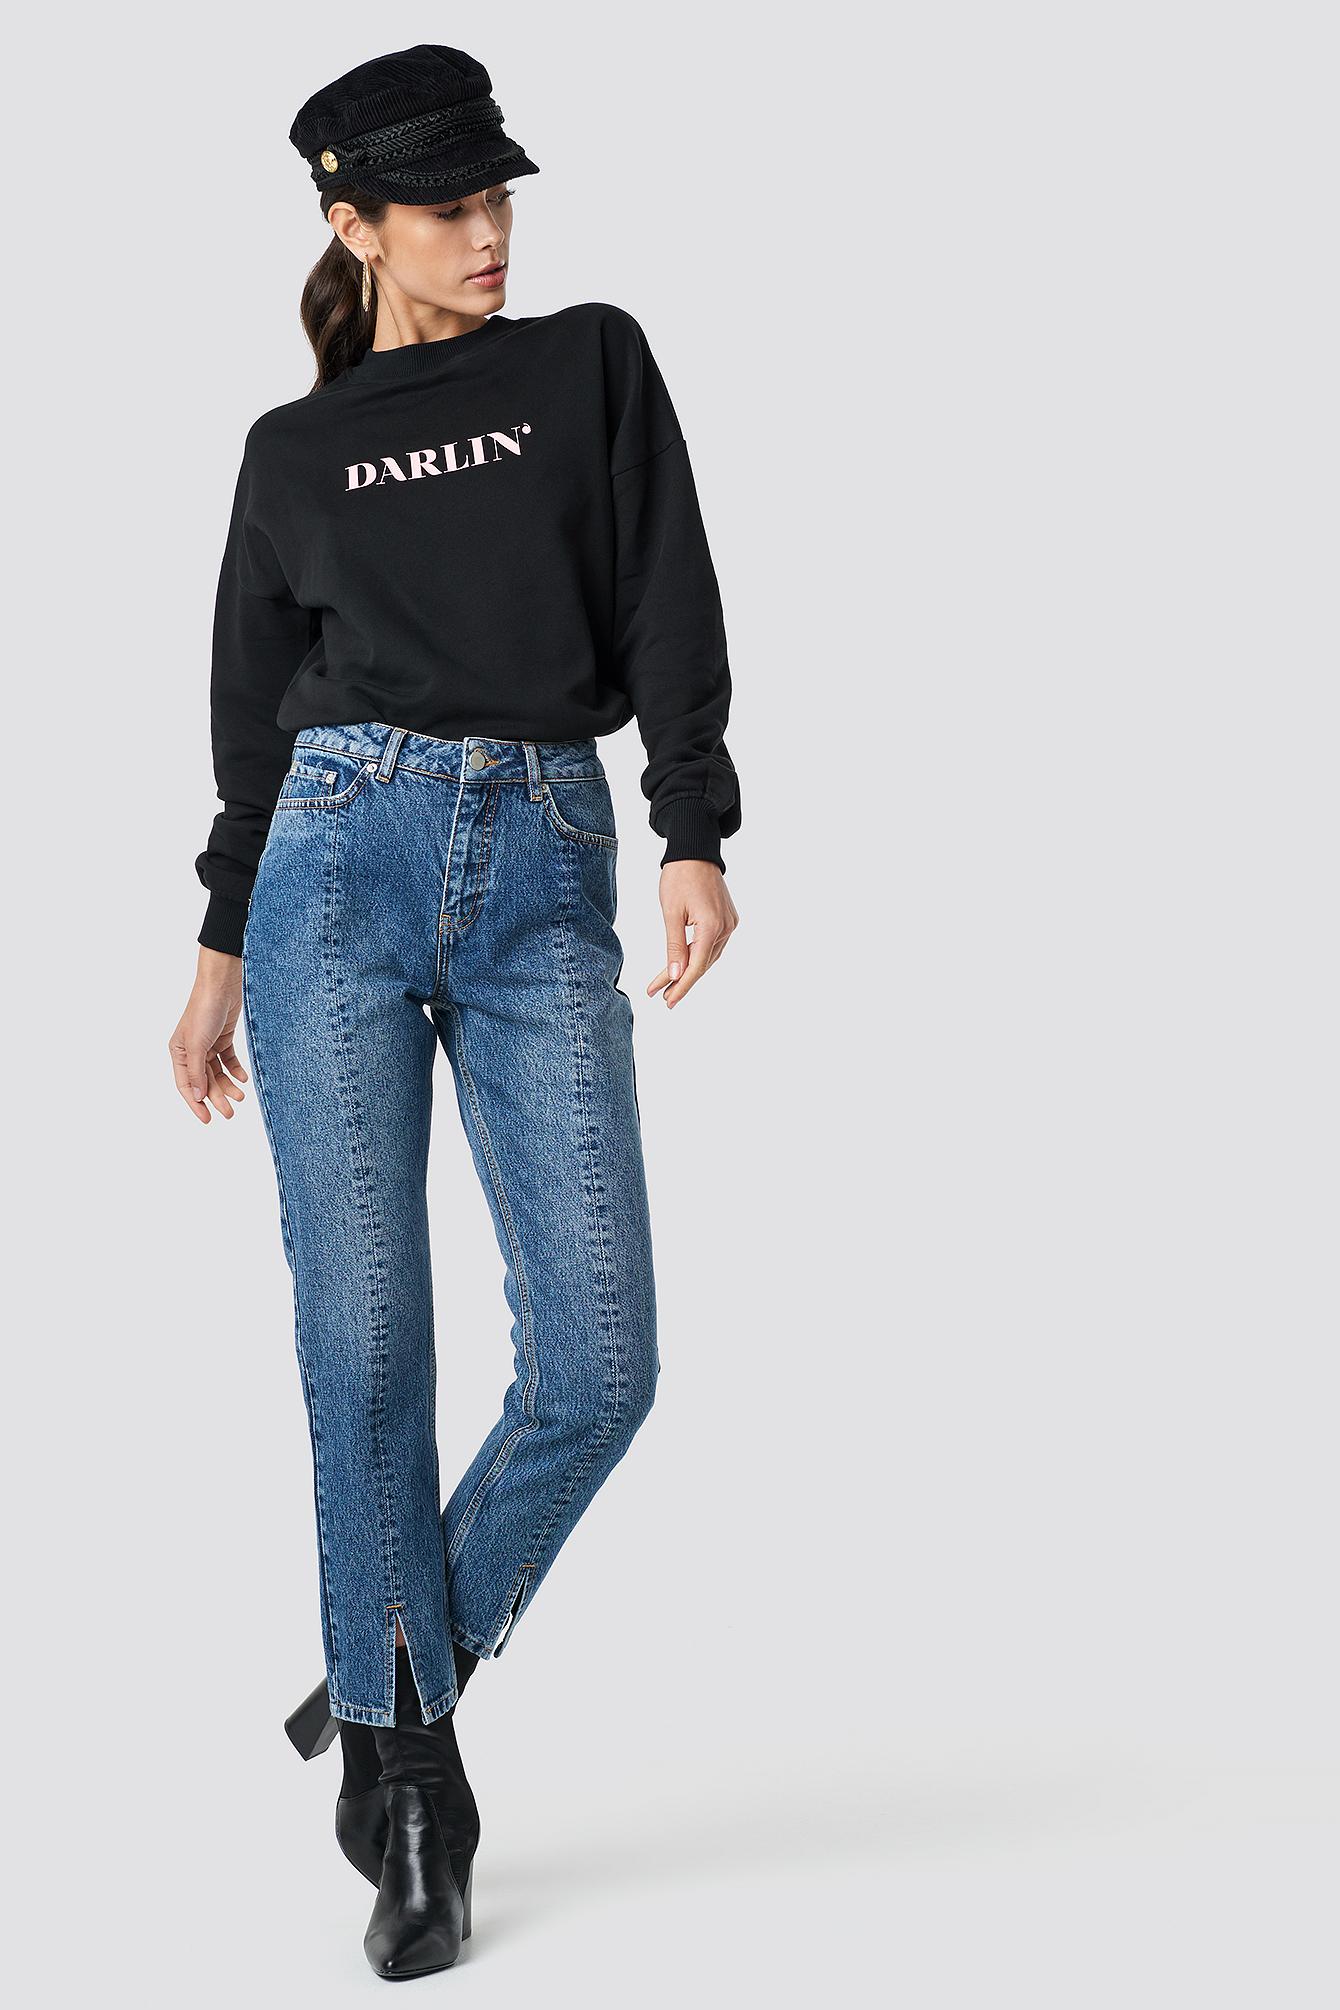 Darlin' Sweatshirt NA-KD.COM